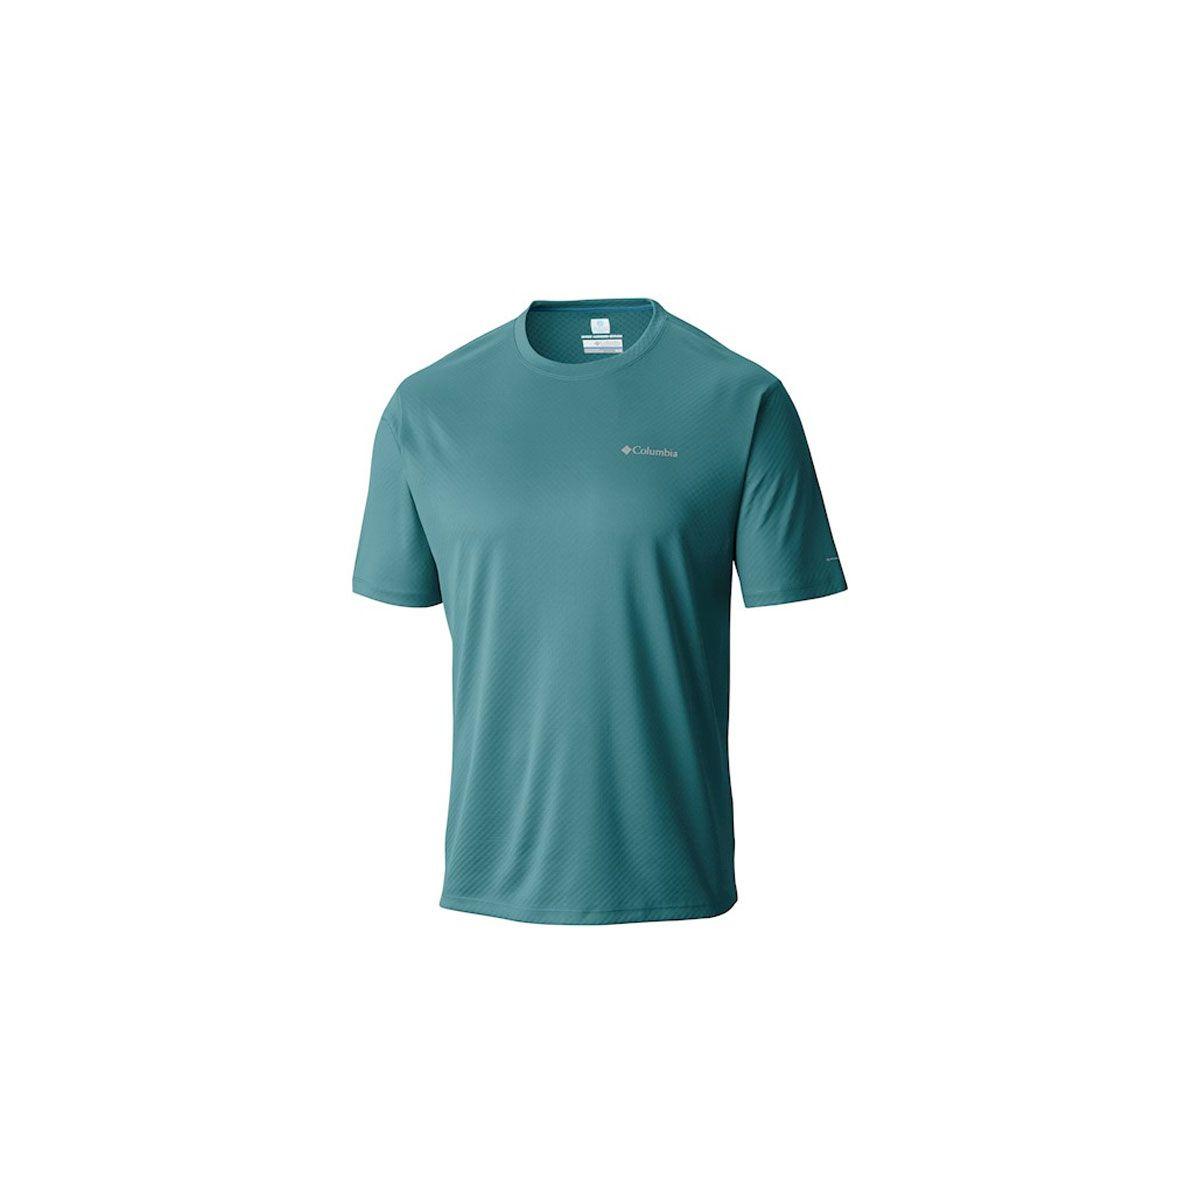 Camiseta Columbia Zero Rules Short Sleeve Shirt Teal